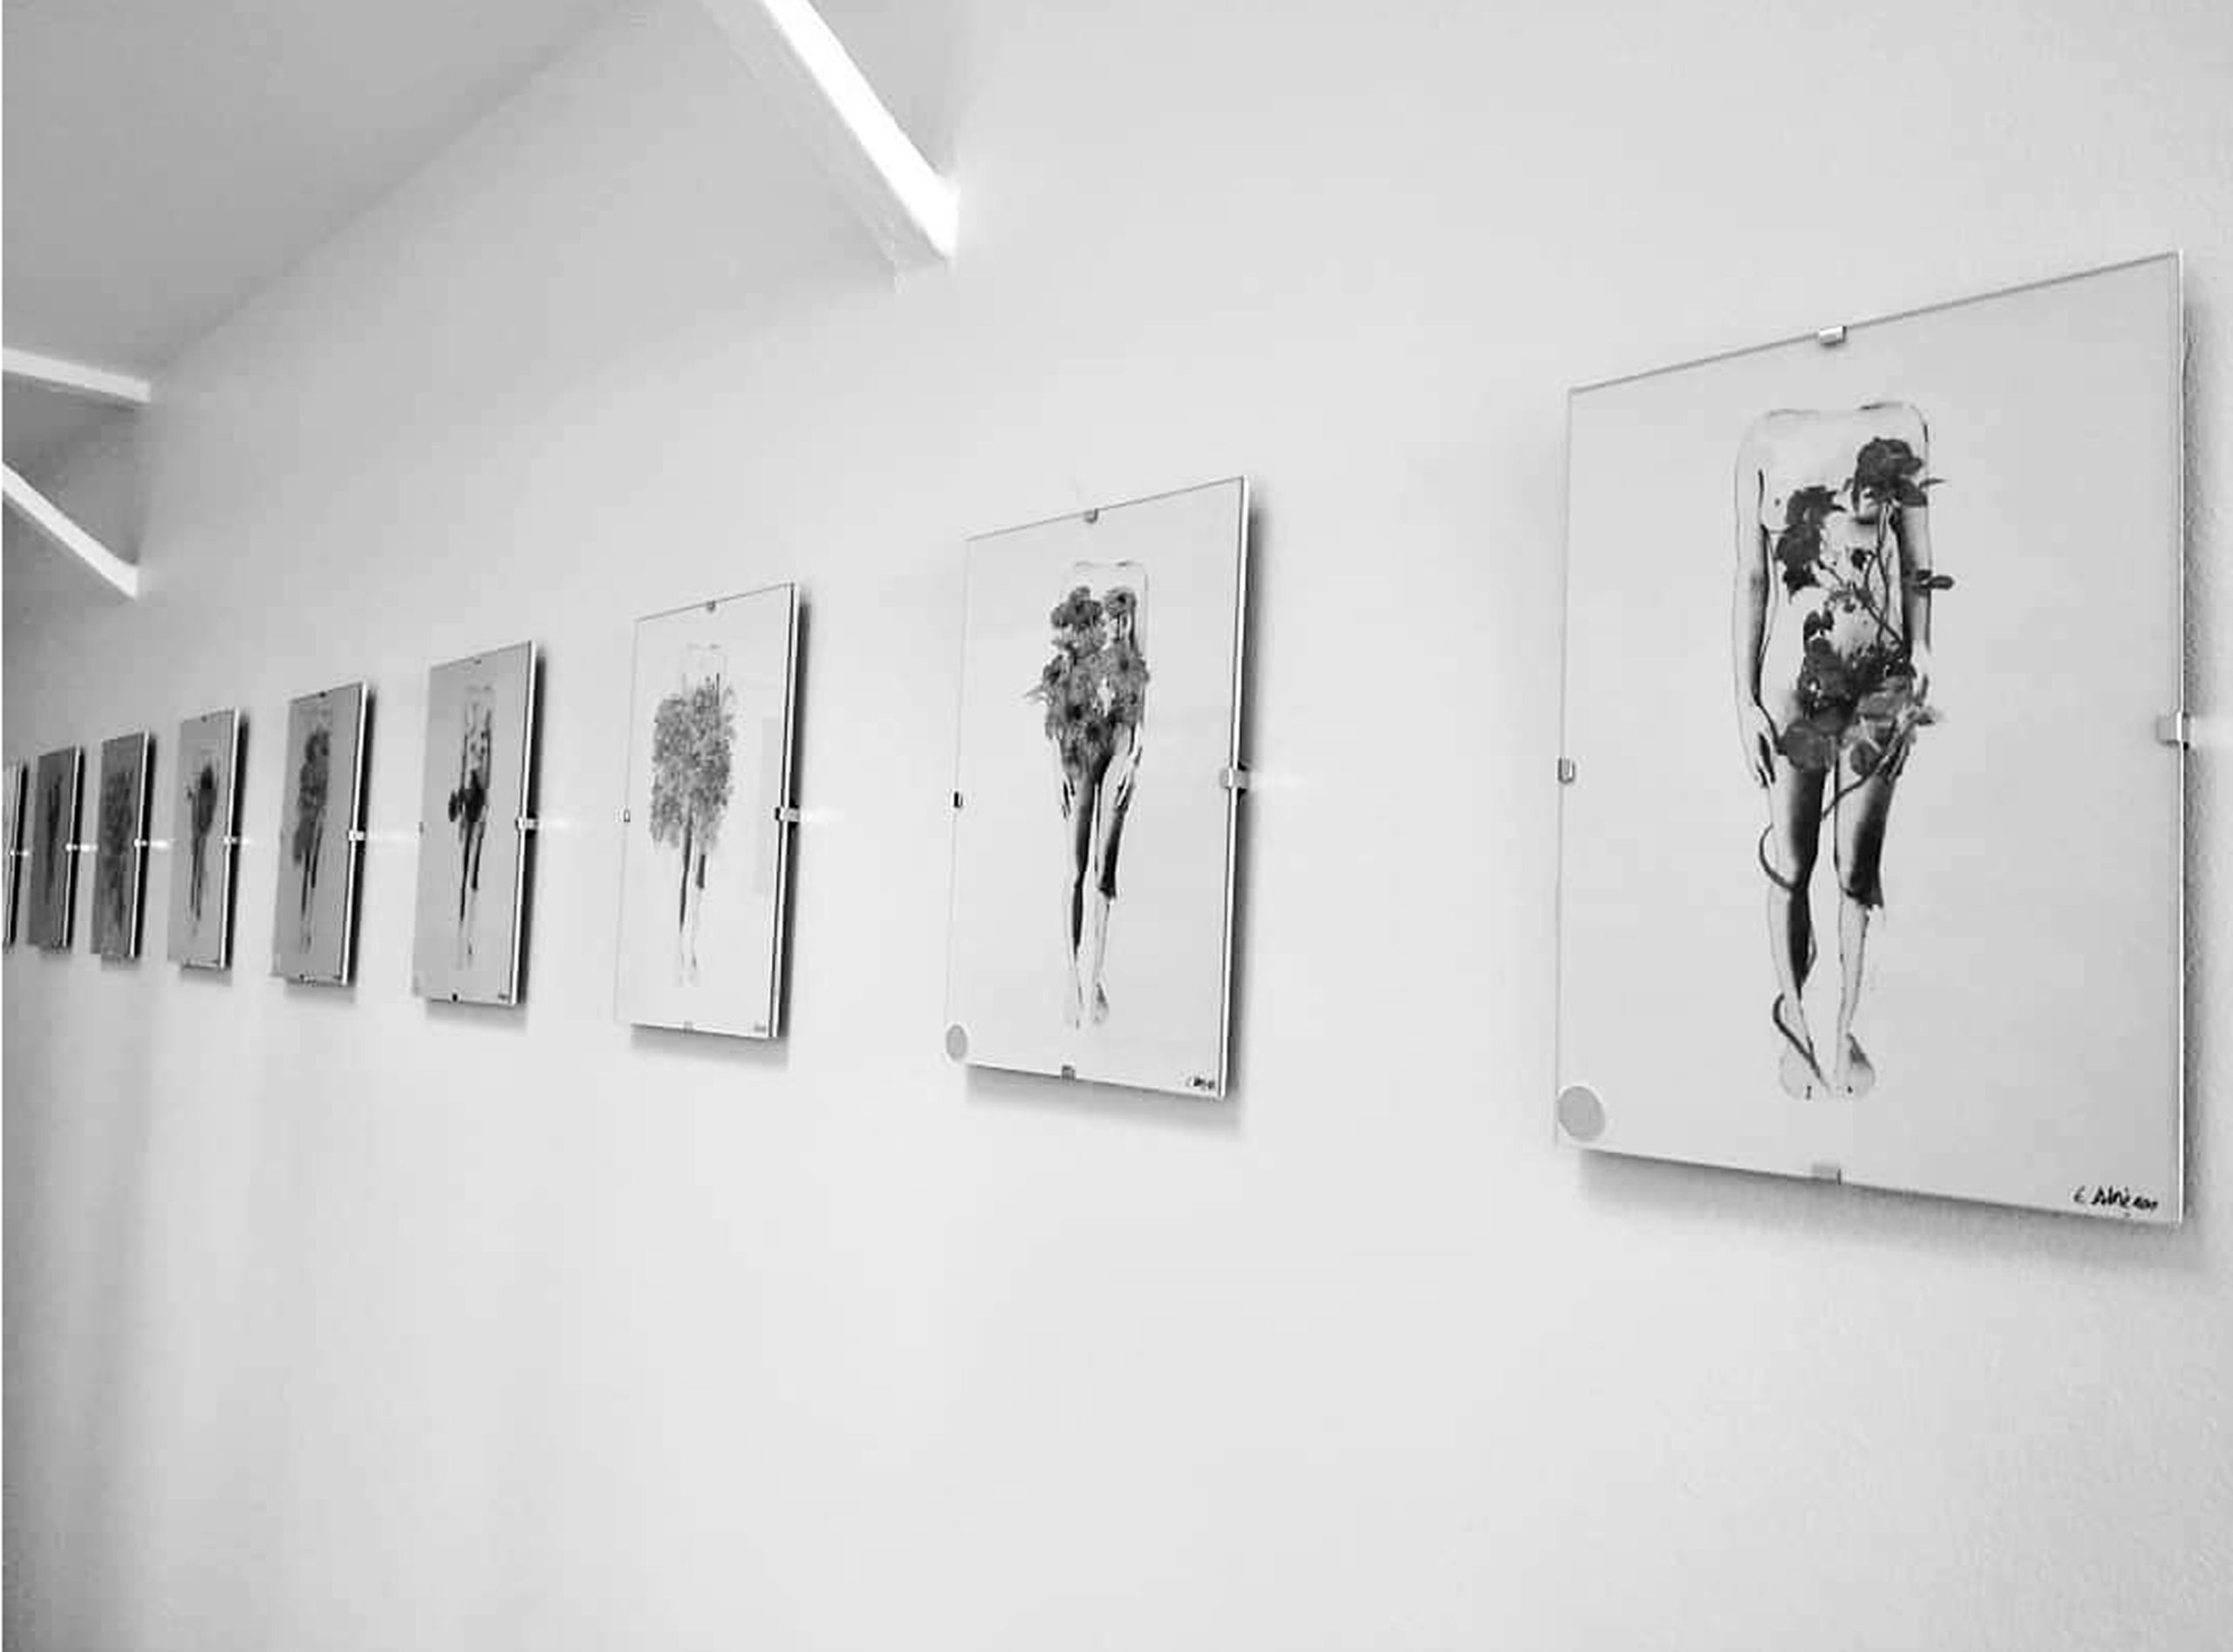 Vue d'exposition, 2020 ©Alméras